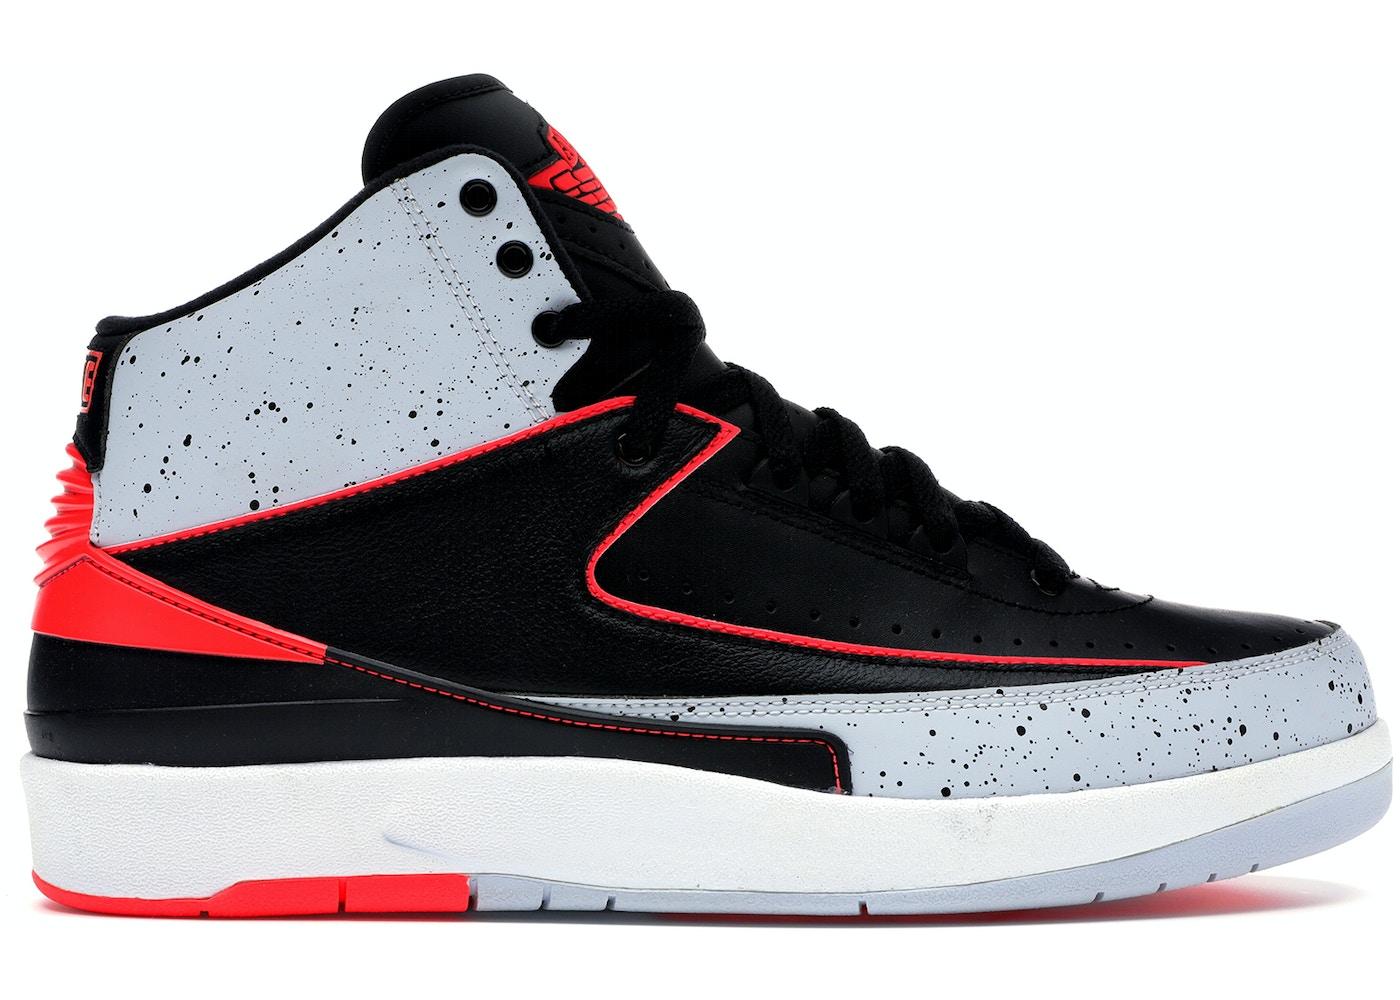 f4229e36c33b Buy Air Jordan 2 Size 7 Shoes   Deadstock Sneakers